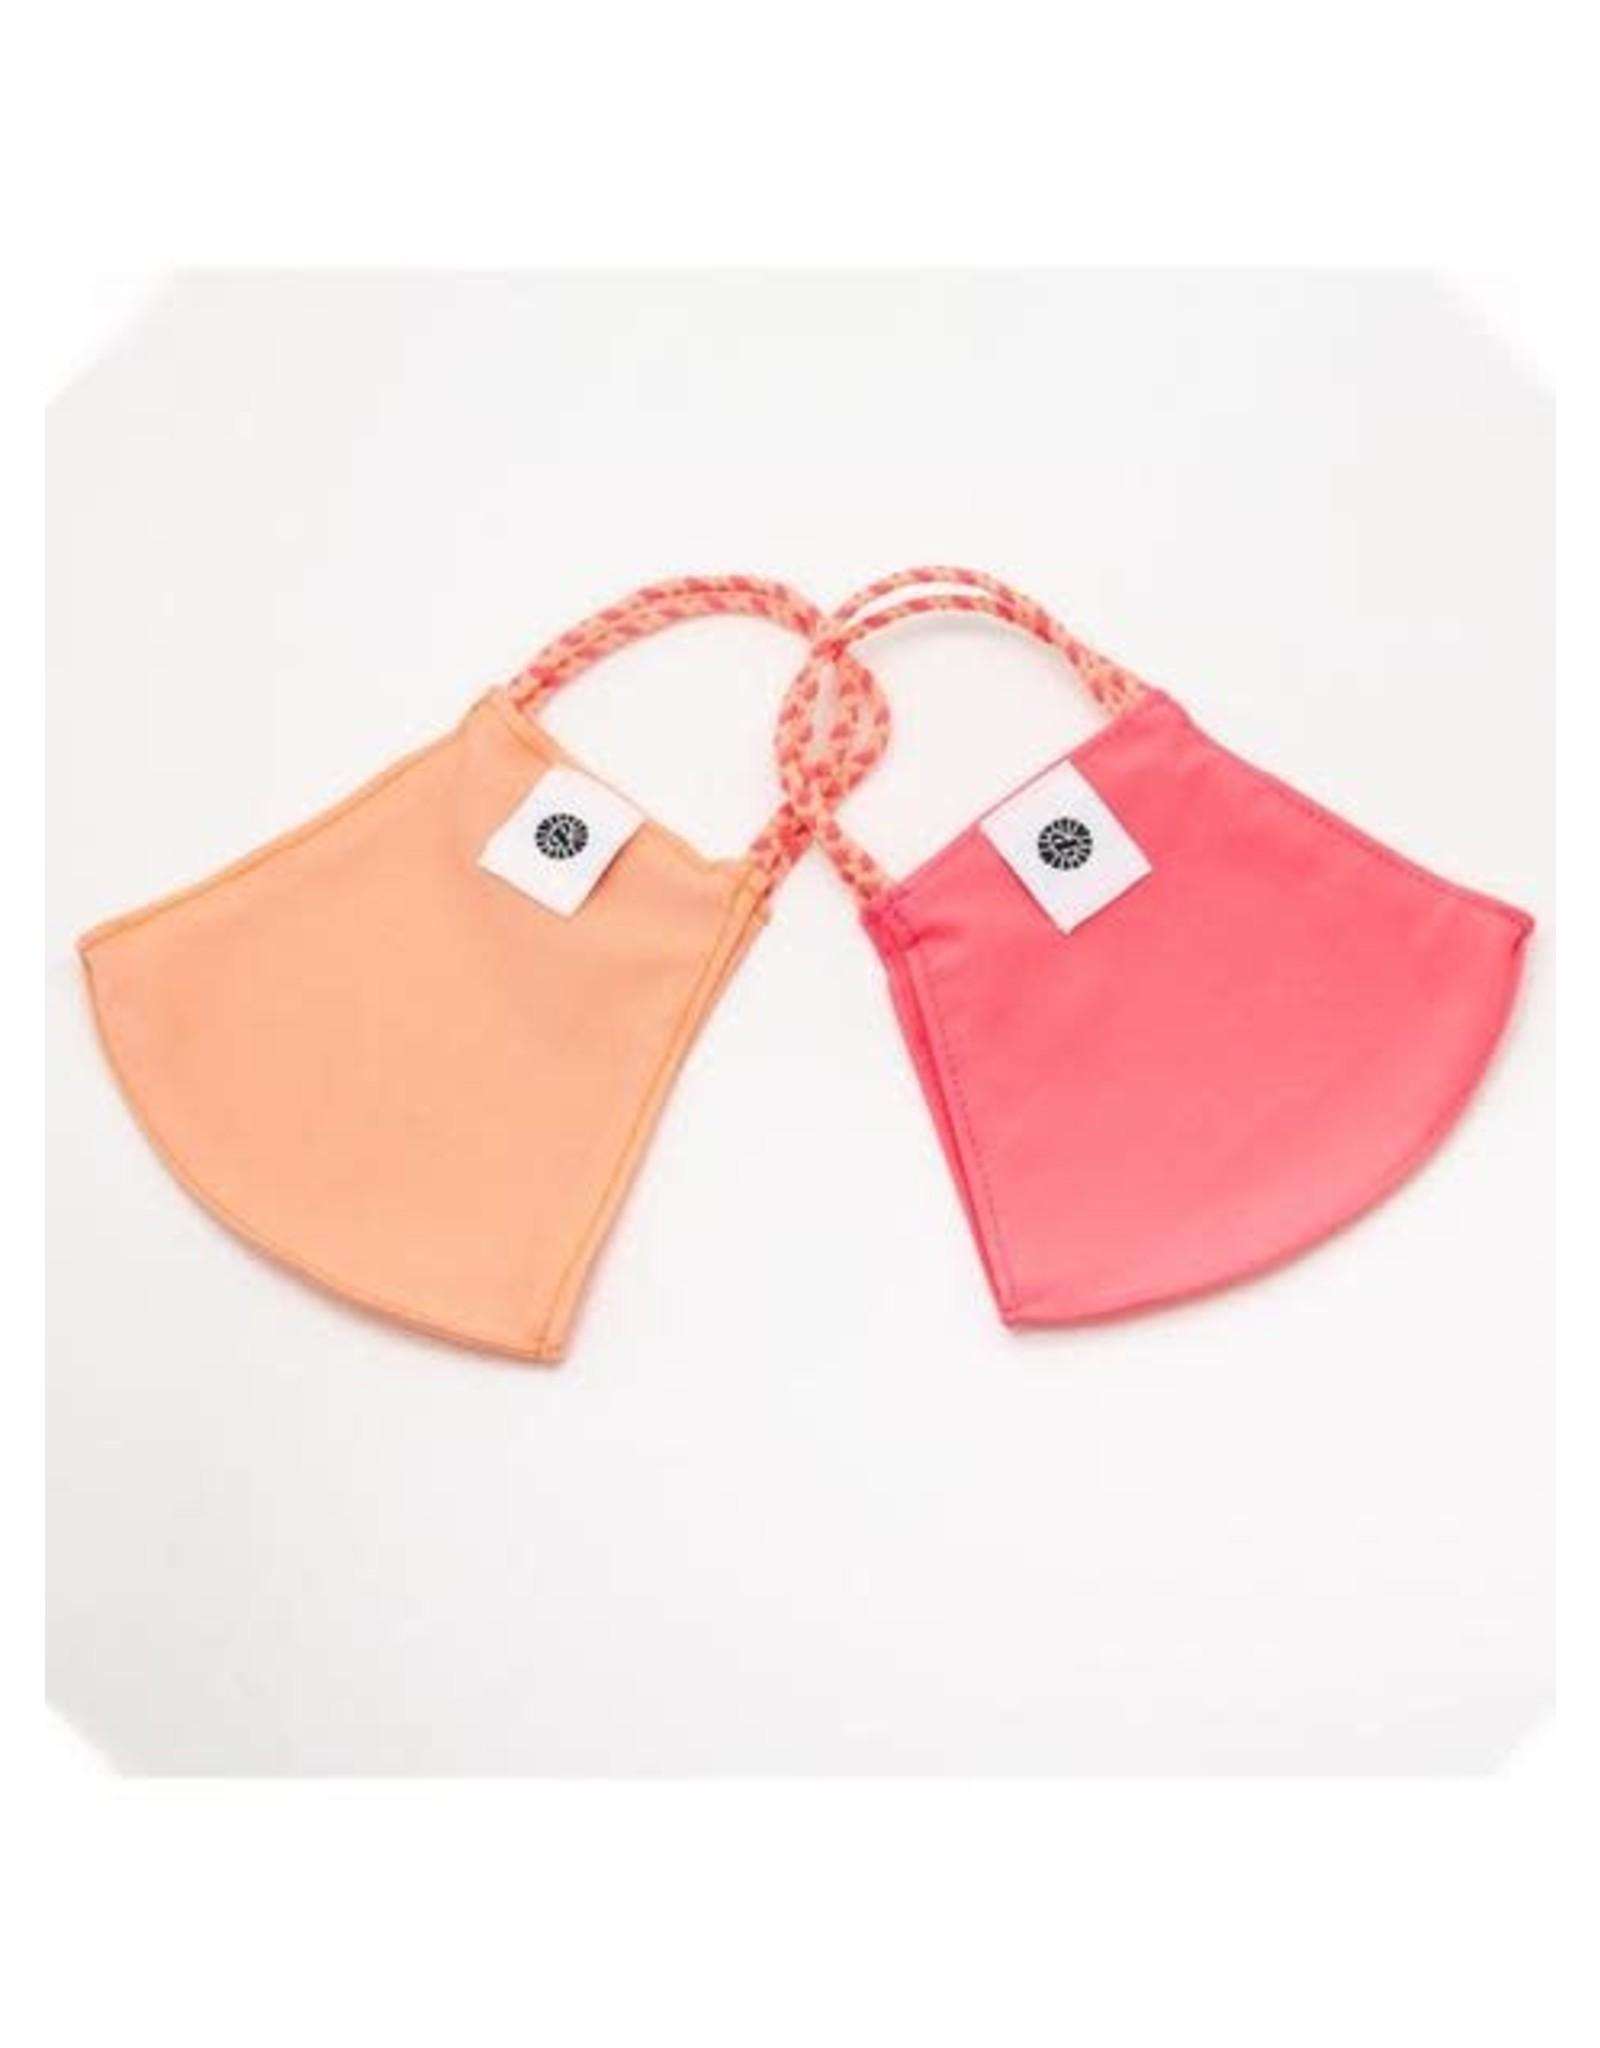 Pomchie Mask- Peachy /Neon